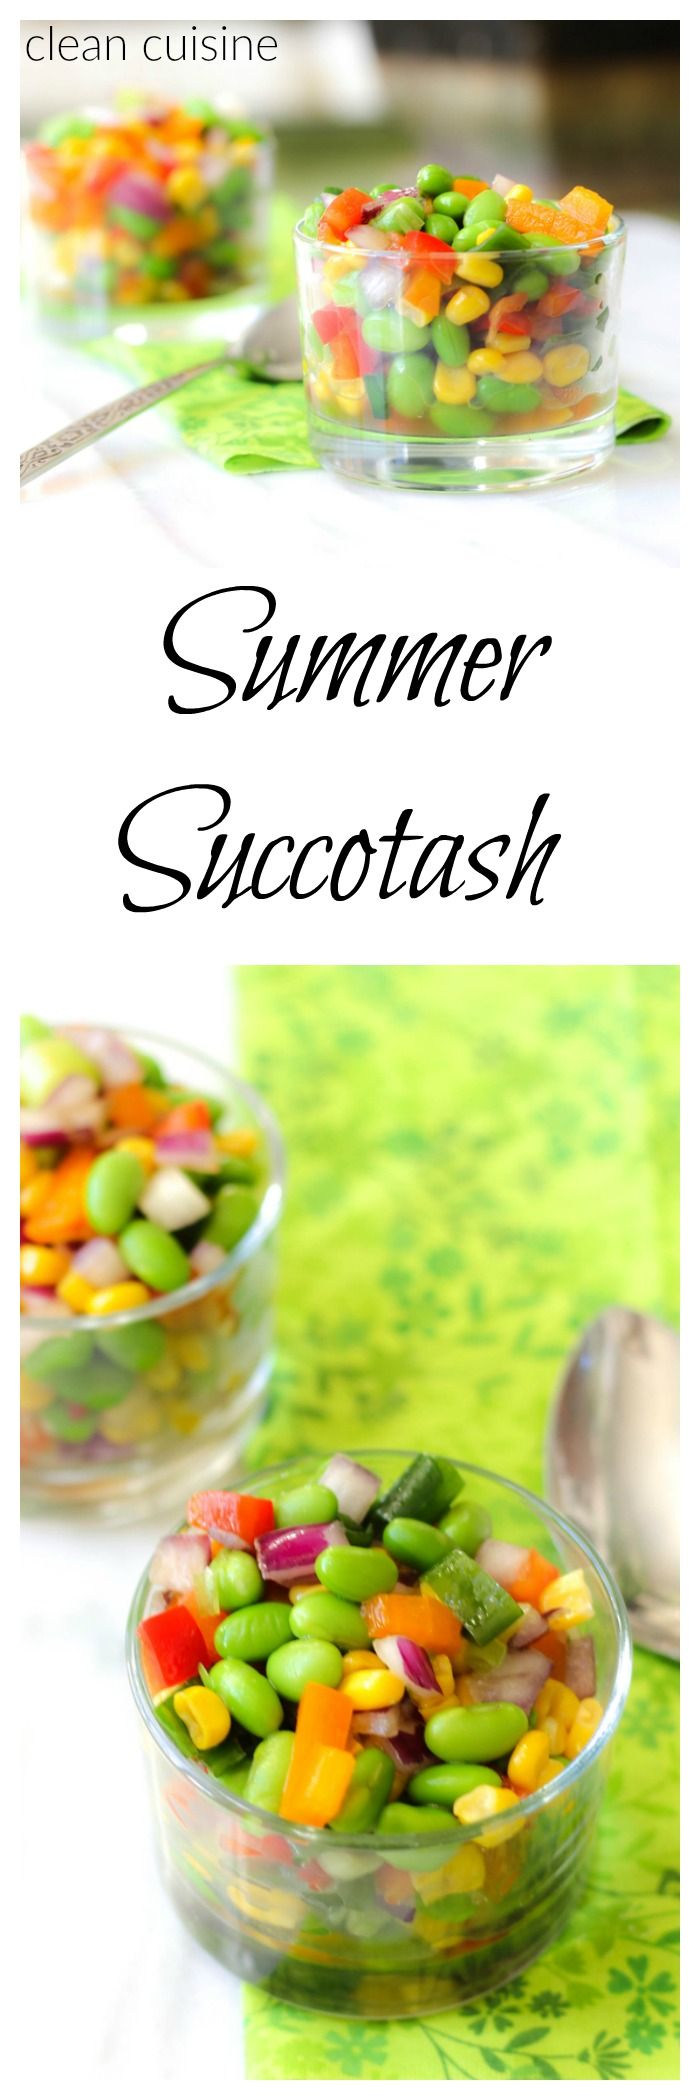 Clean Summer Succotash Recipe with Corn + Edamame Beans is Butter Free ---clean cuisine